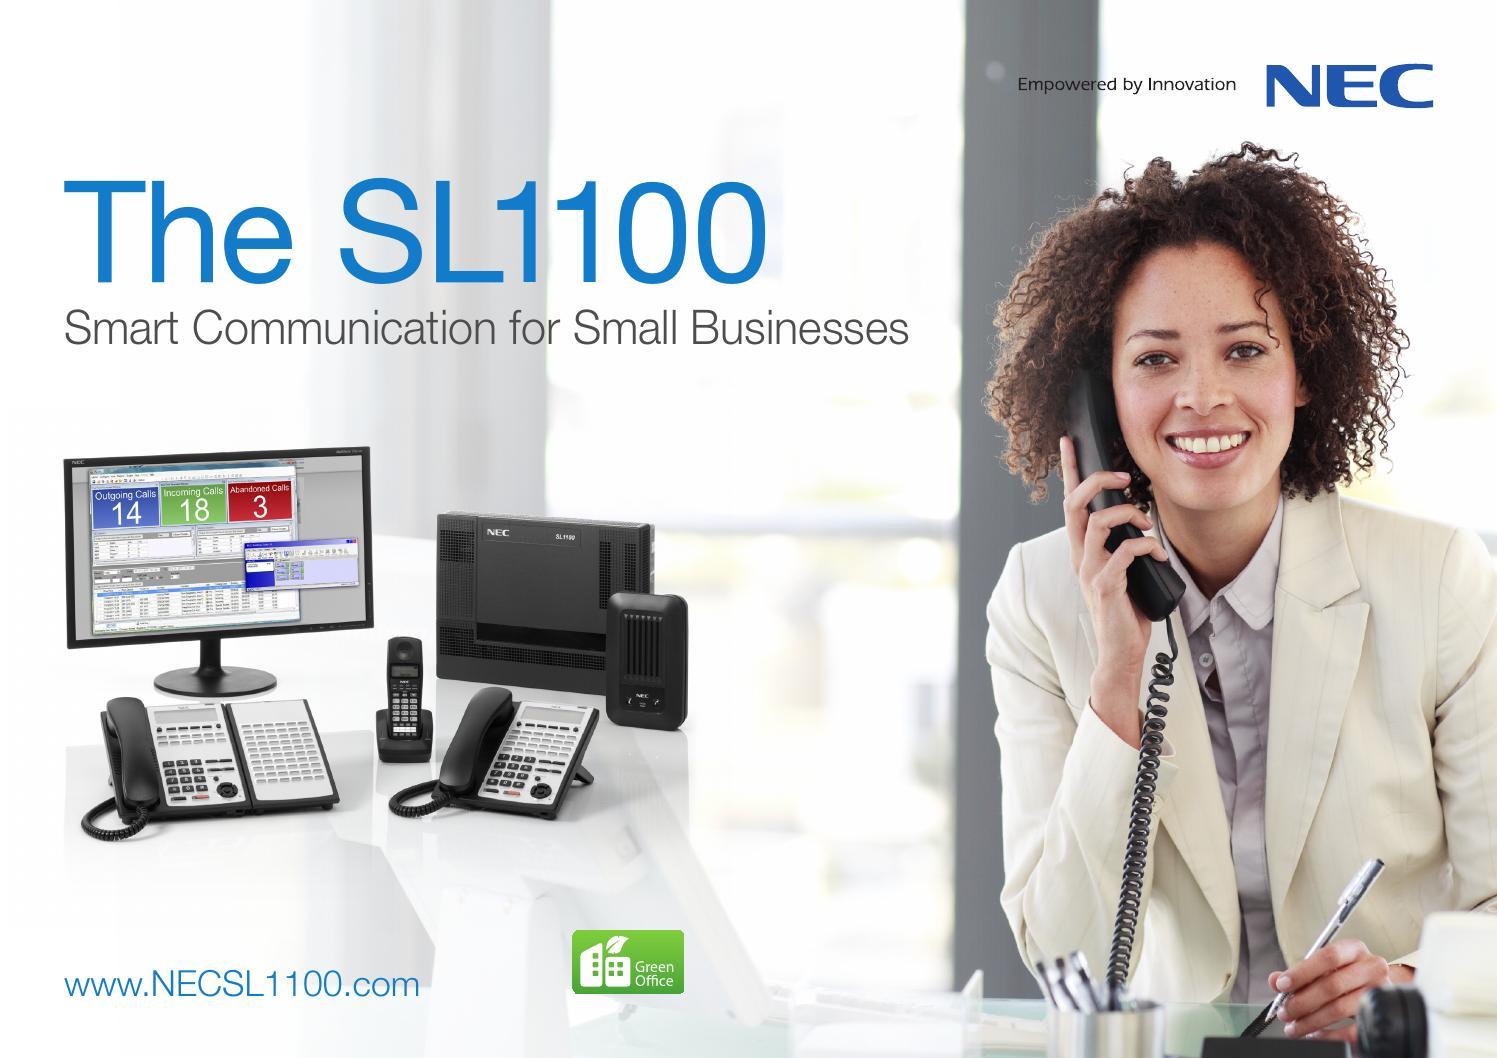 Nec sl1100 brochure by CenterCityCommunications - issuu